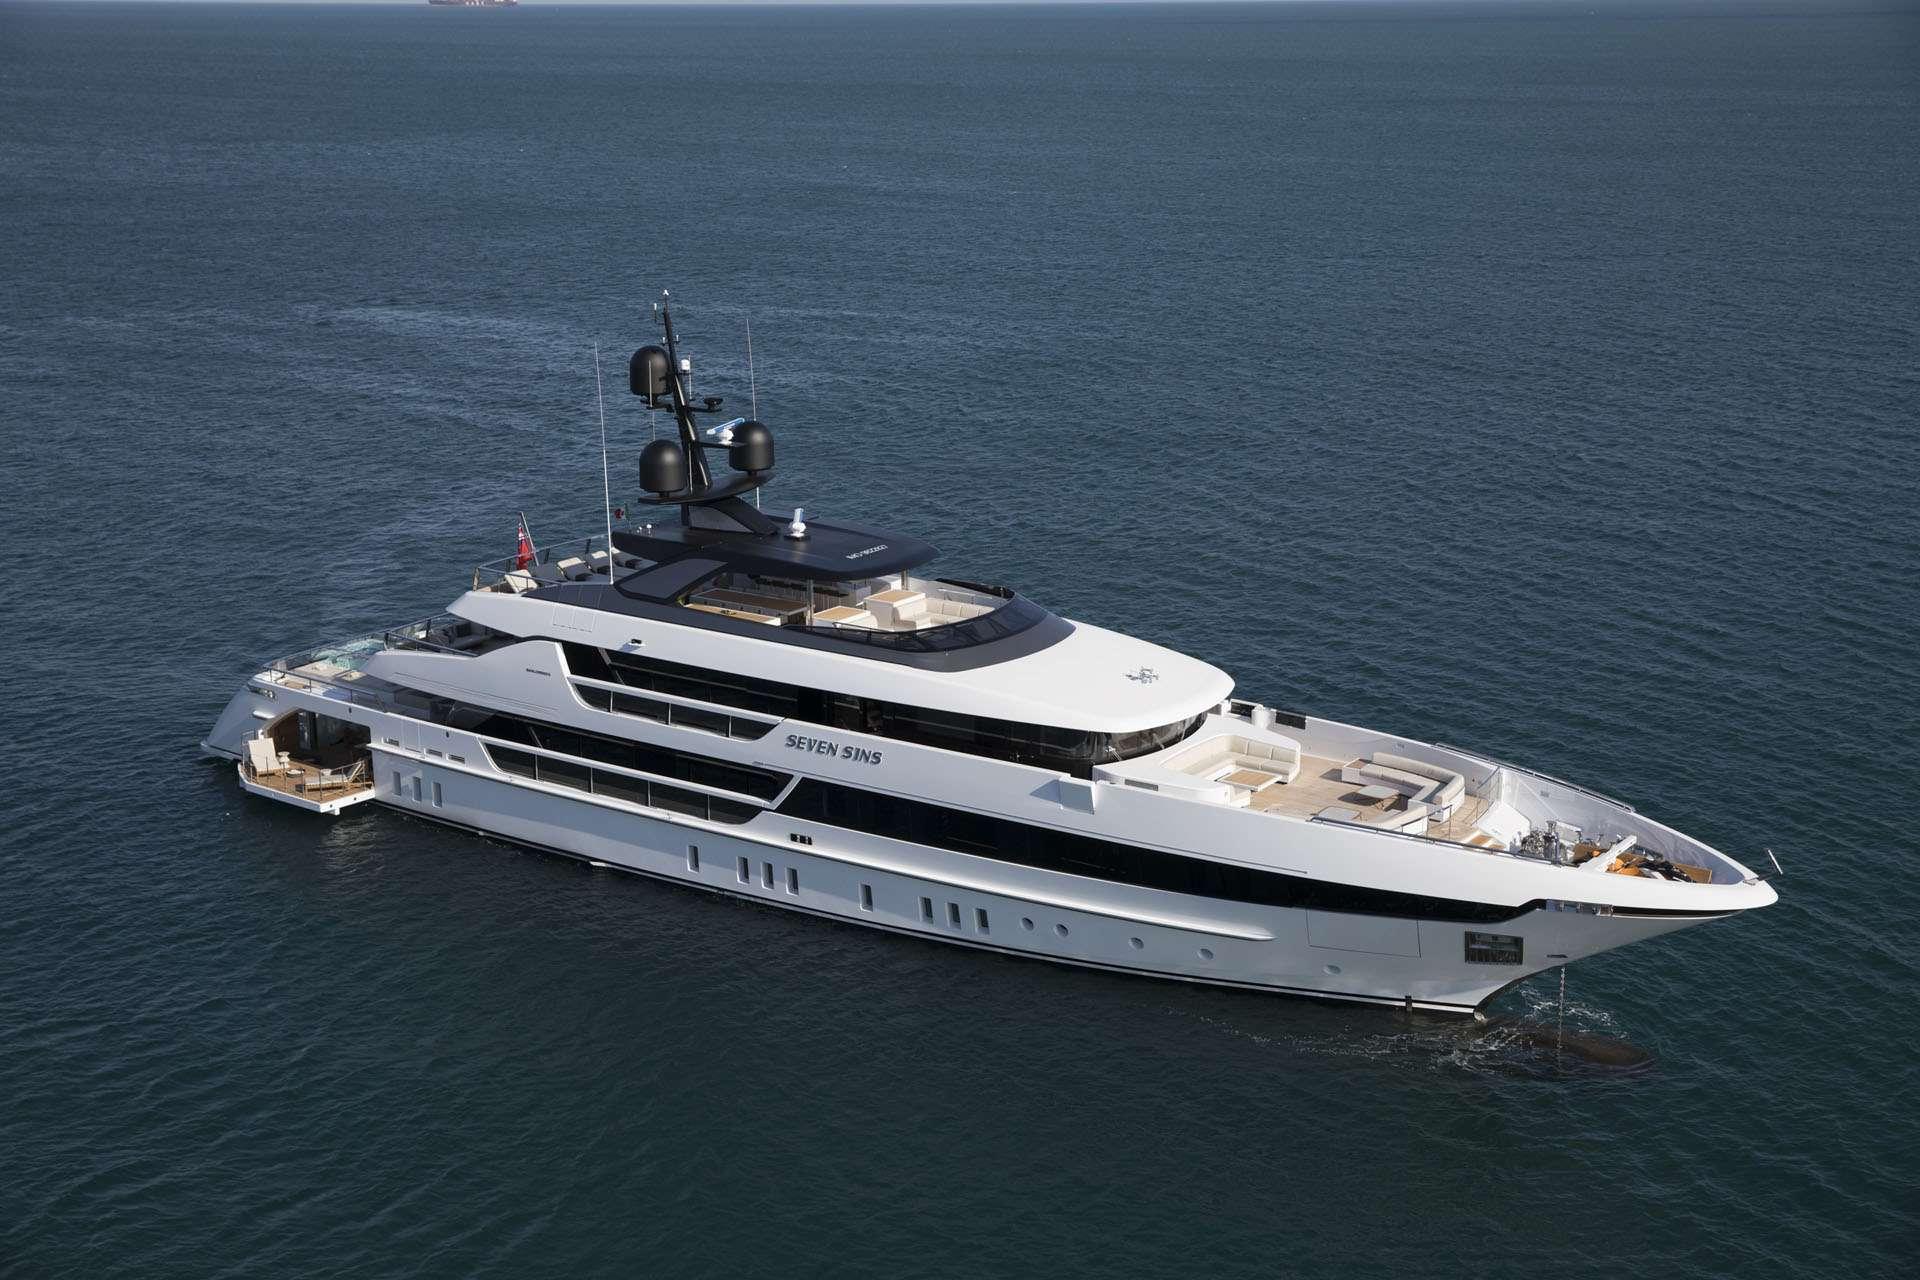 Image of SEVEN SINS II yacht #17